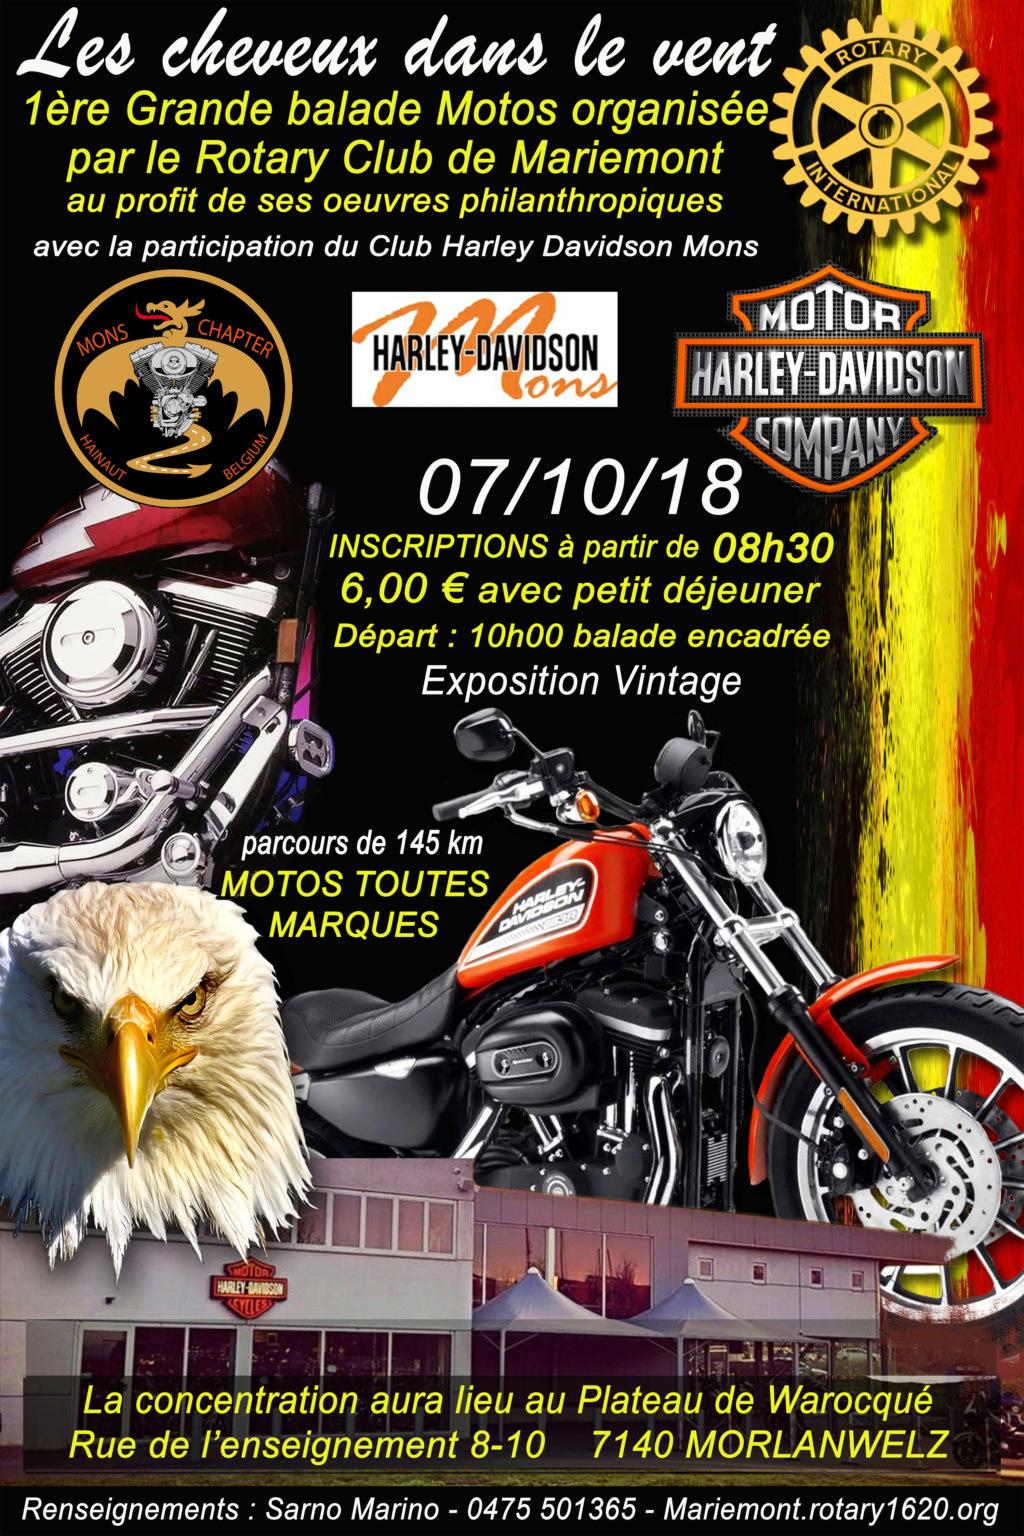 Balade - 7 octobre 2018 - Morlanwelz (7140) belgique  Charit14